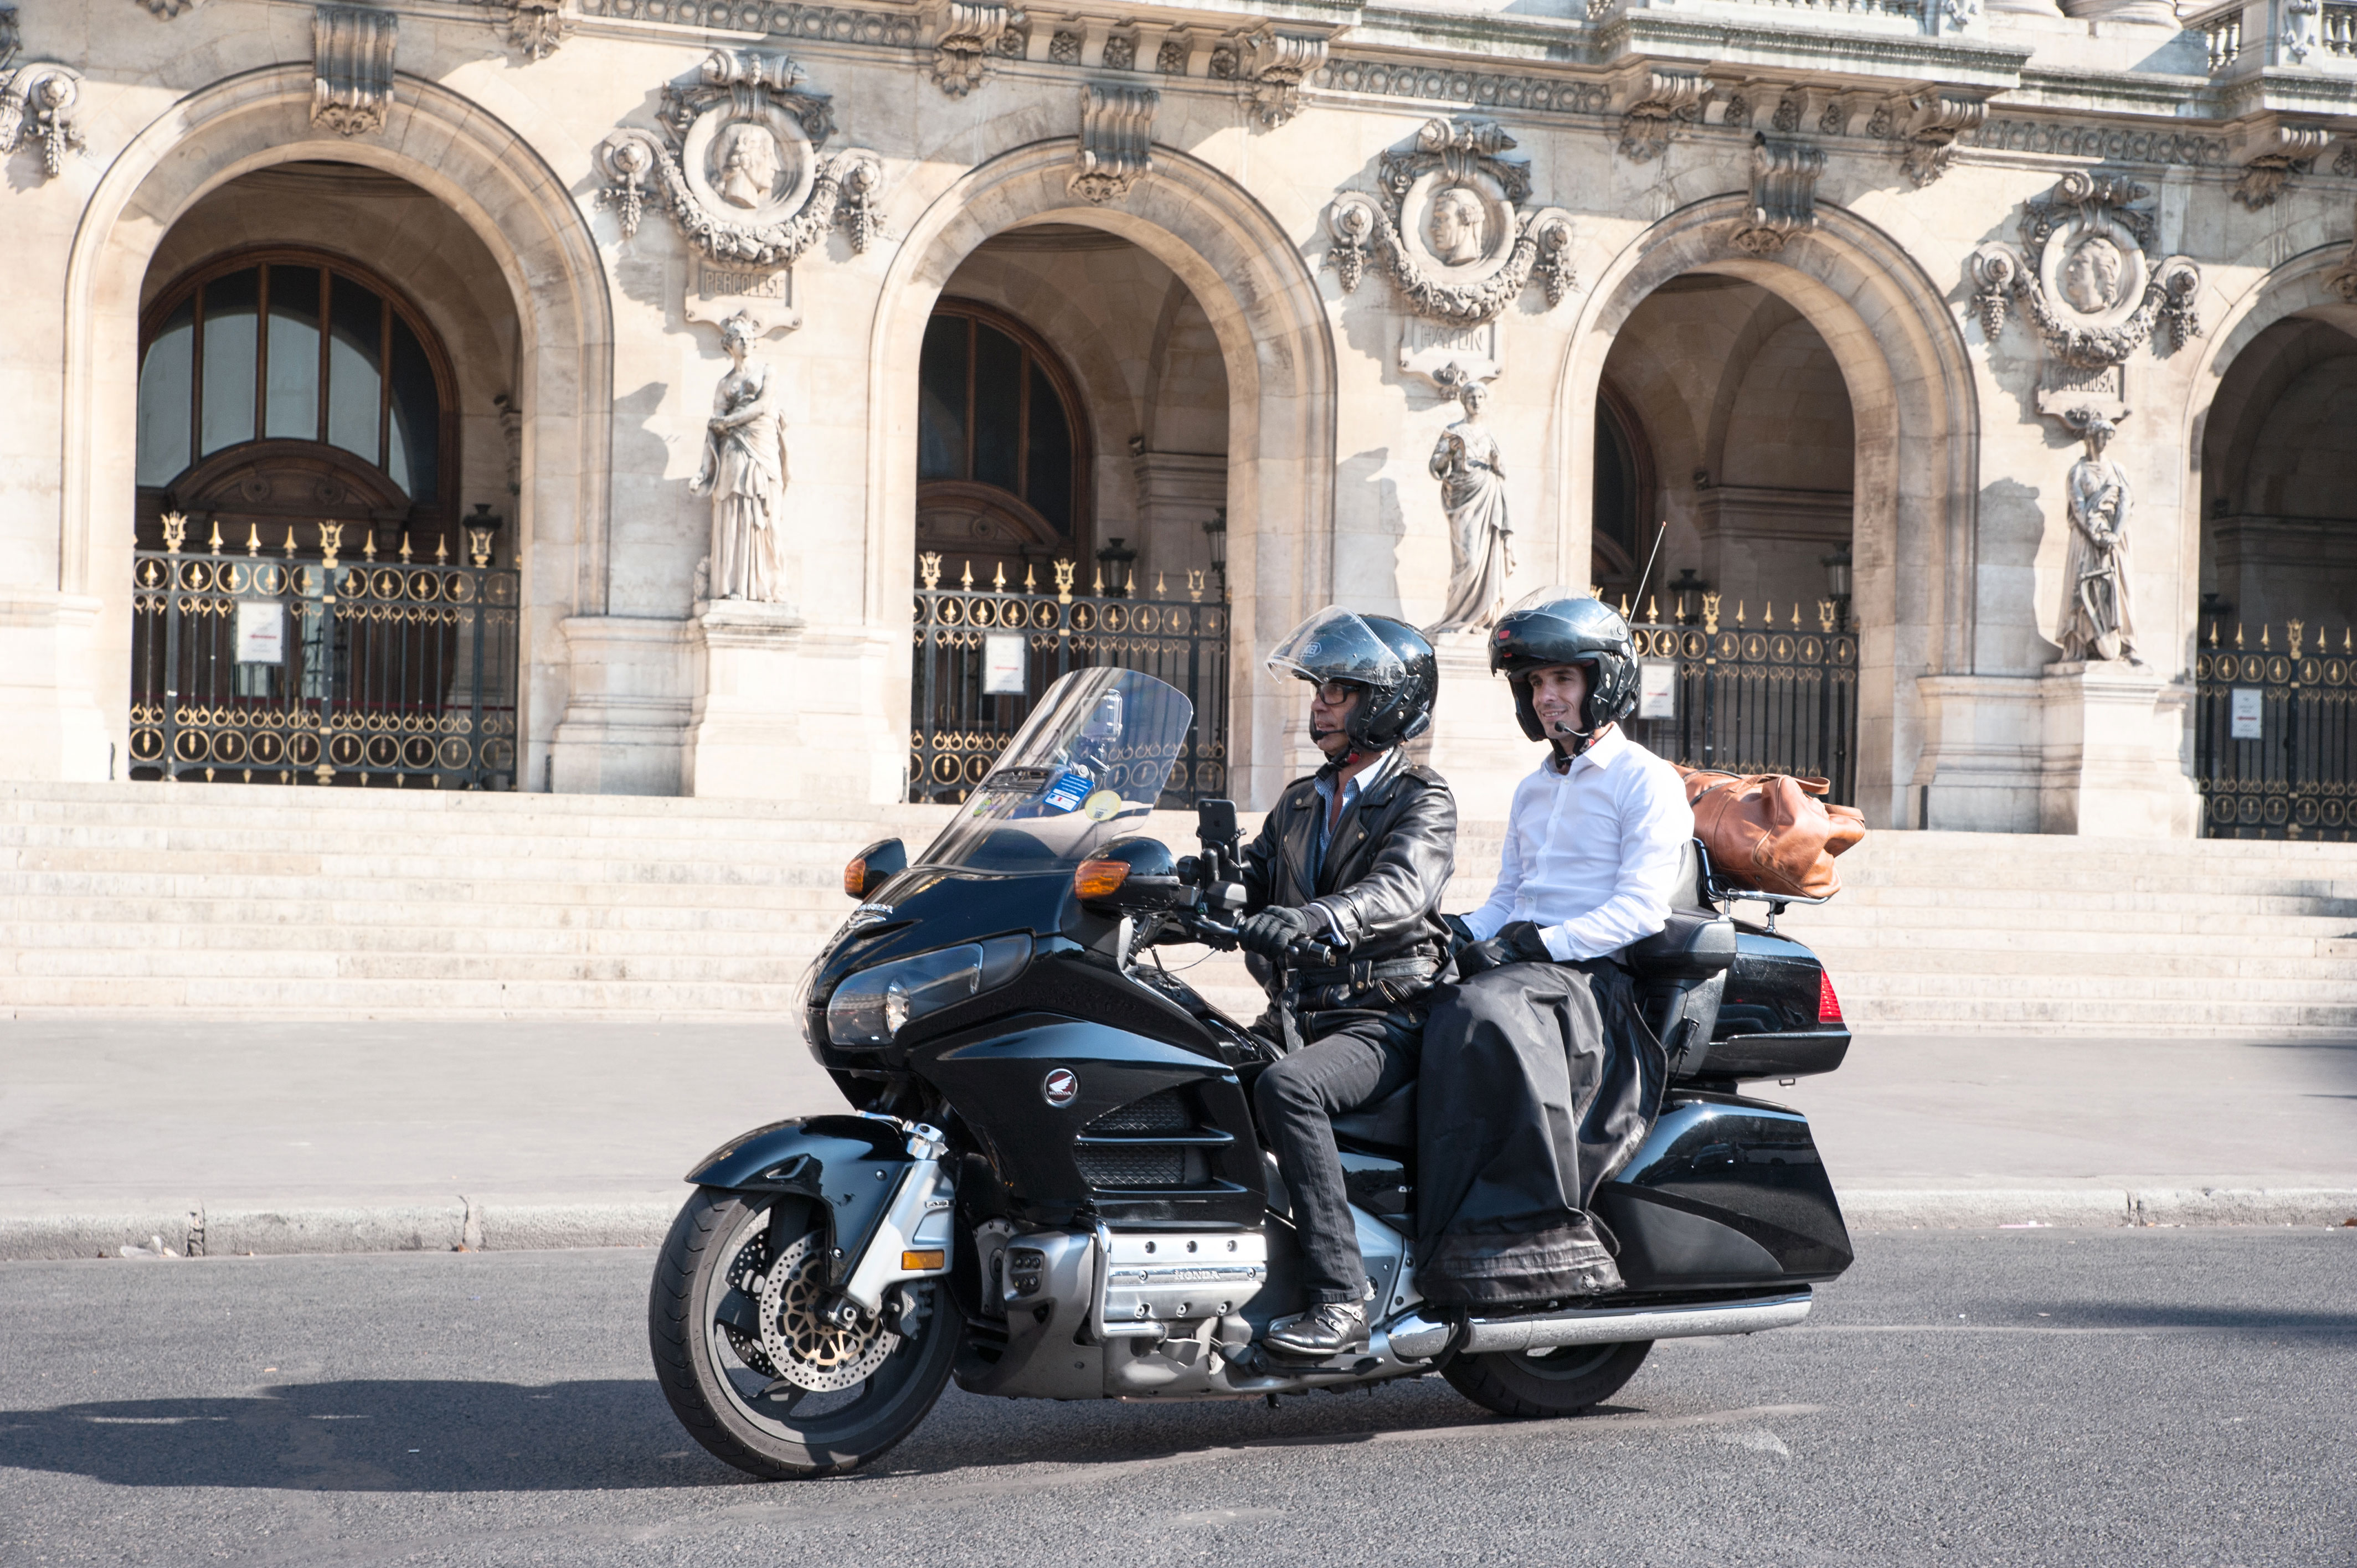 tarifs taxi moto la r f rence du moto taxi paris. Black Bedroom Furniture Sets. Home Design Ideas